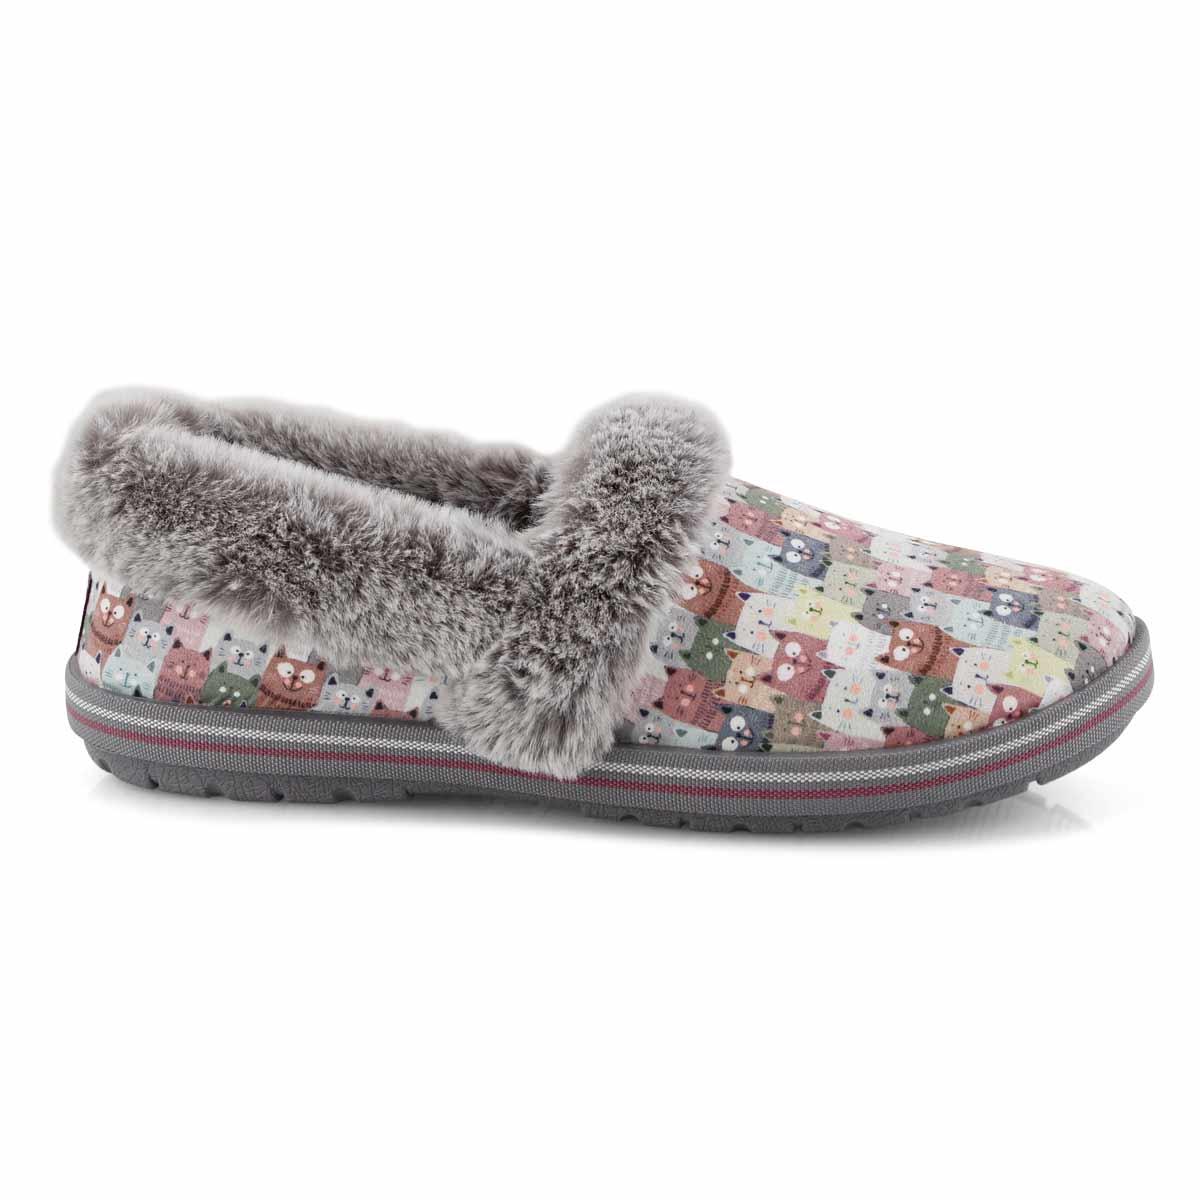 Lds Bobs Too Cozy pnk/multi slipper